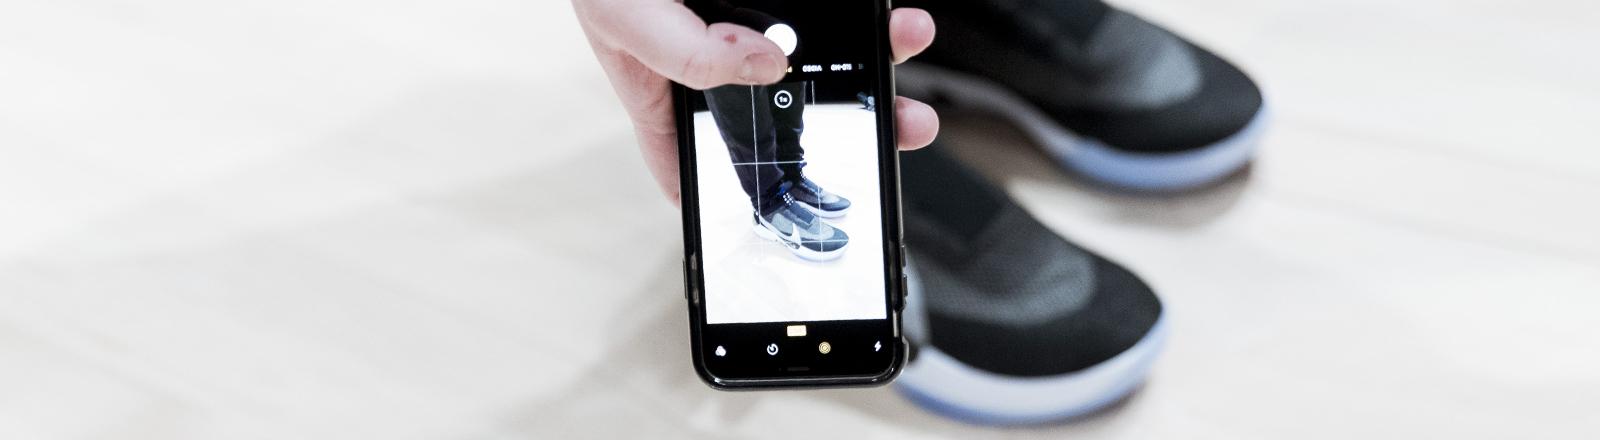 Pressefoto Nike Adapt Schuh mit Steuerung per Smartphone-App